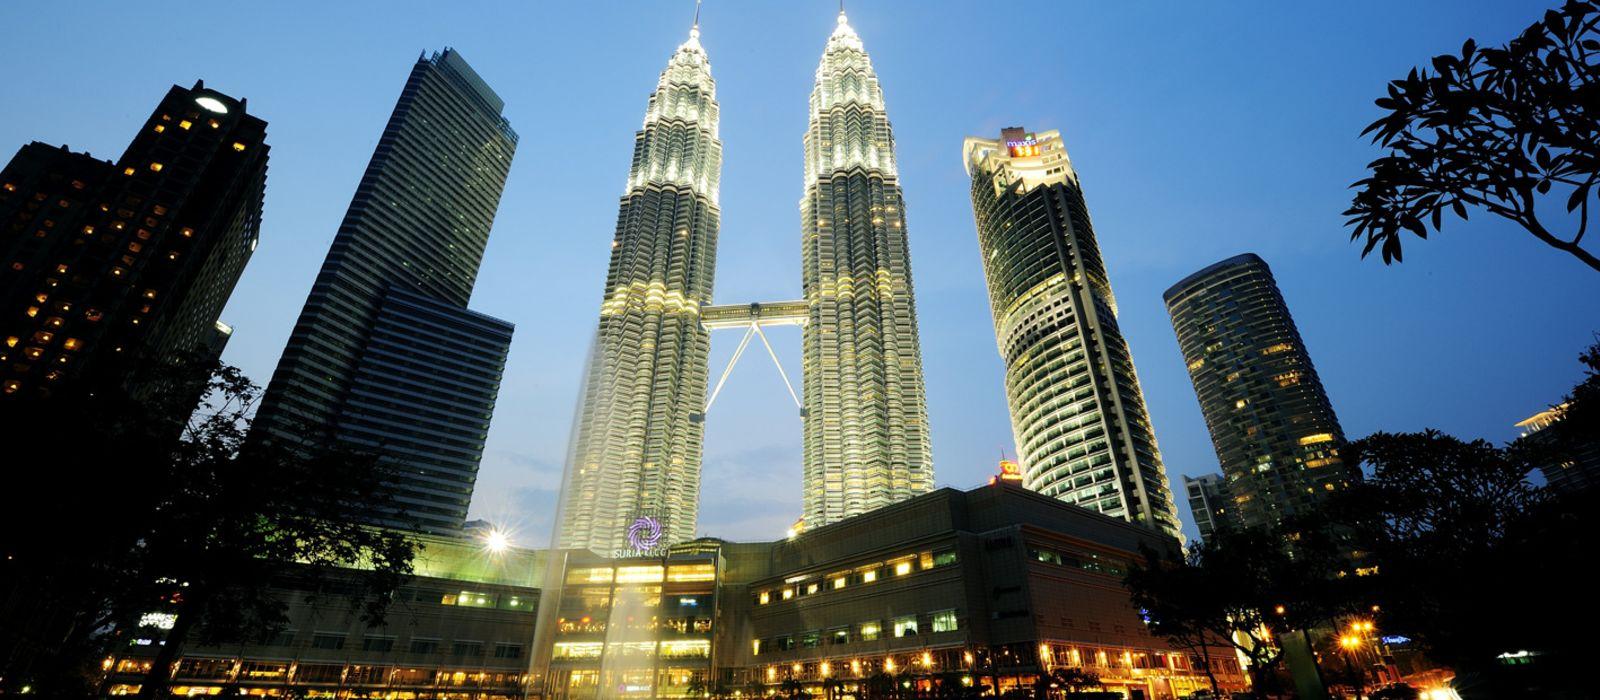 Höhepunkte der Halbinsel Malaysia Urlaub 1